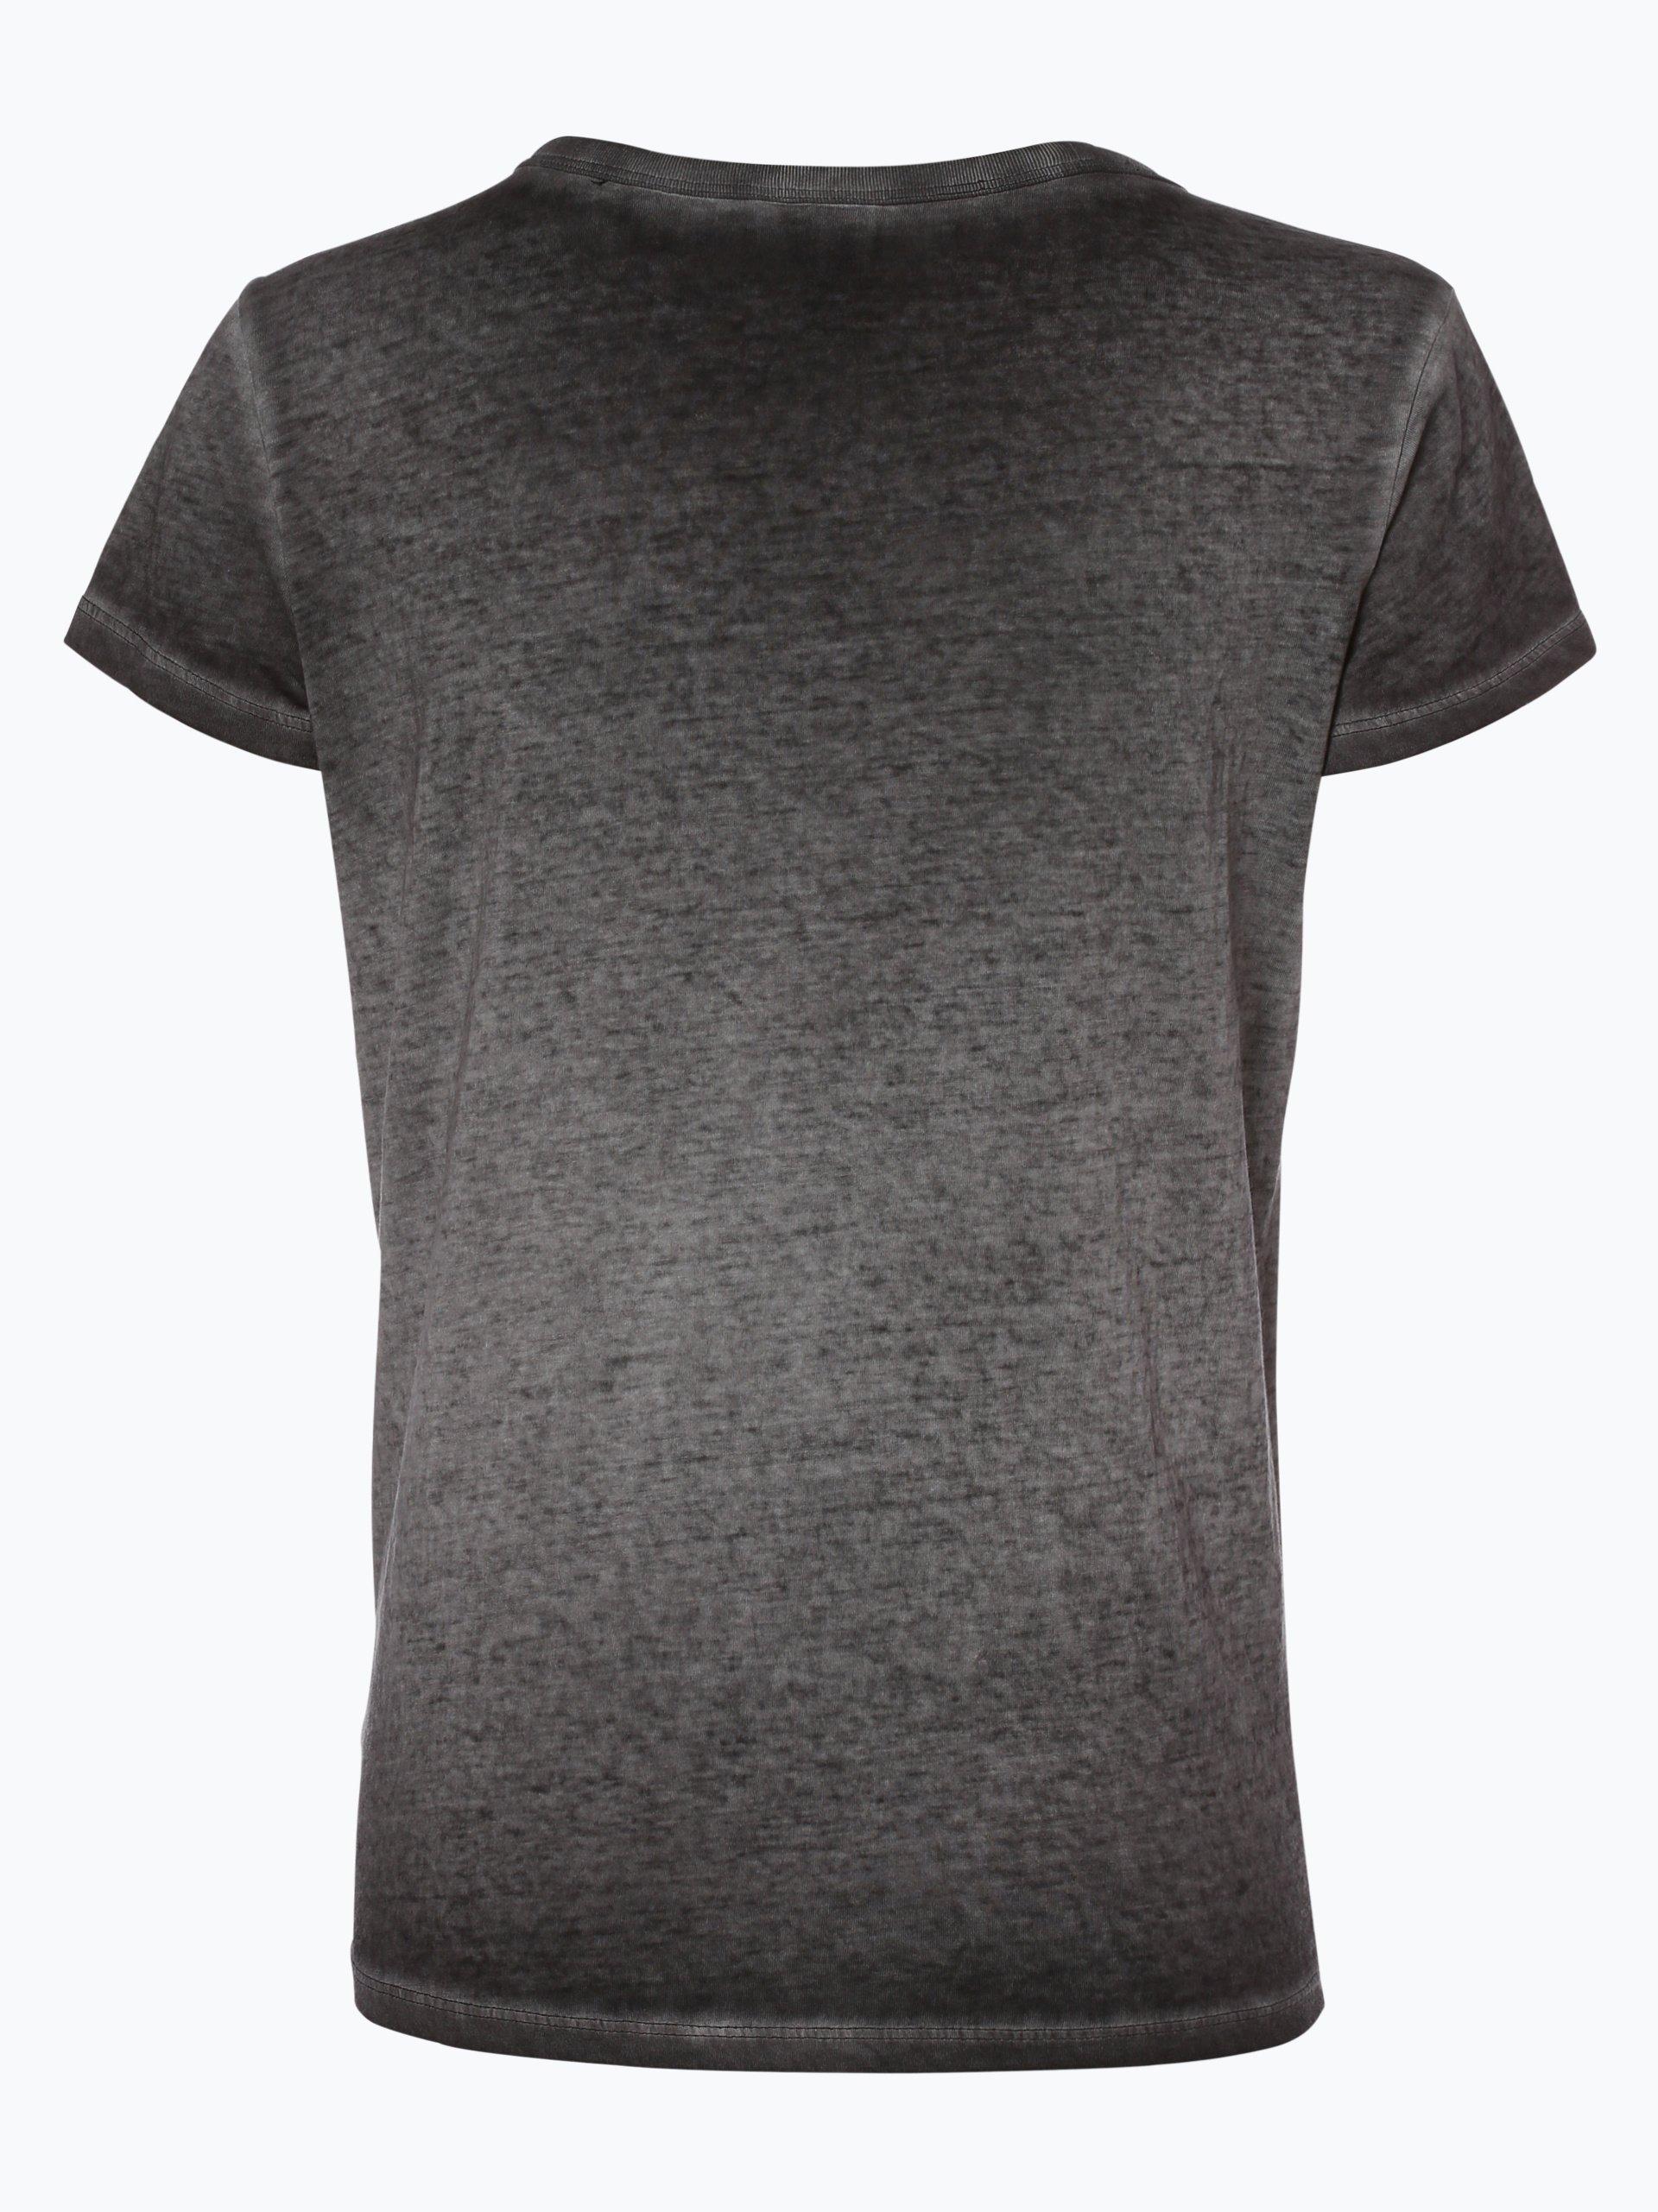 g star damen t shirt trozera online kaufen vangraaf com. Black Bedroom Furniture Sets. Home Design Ideas